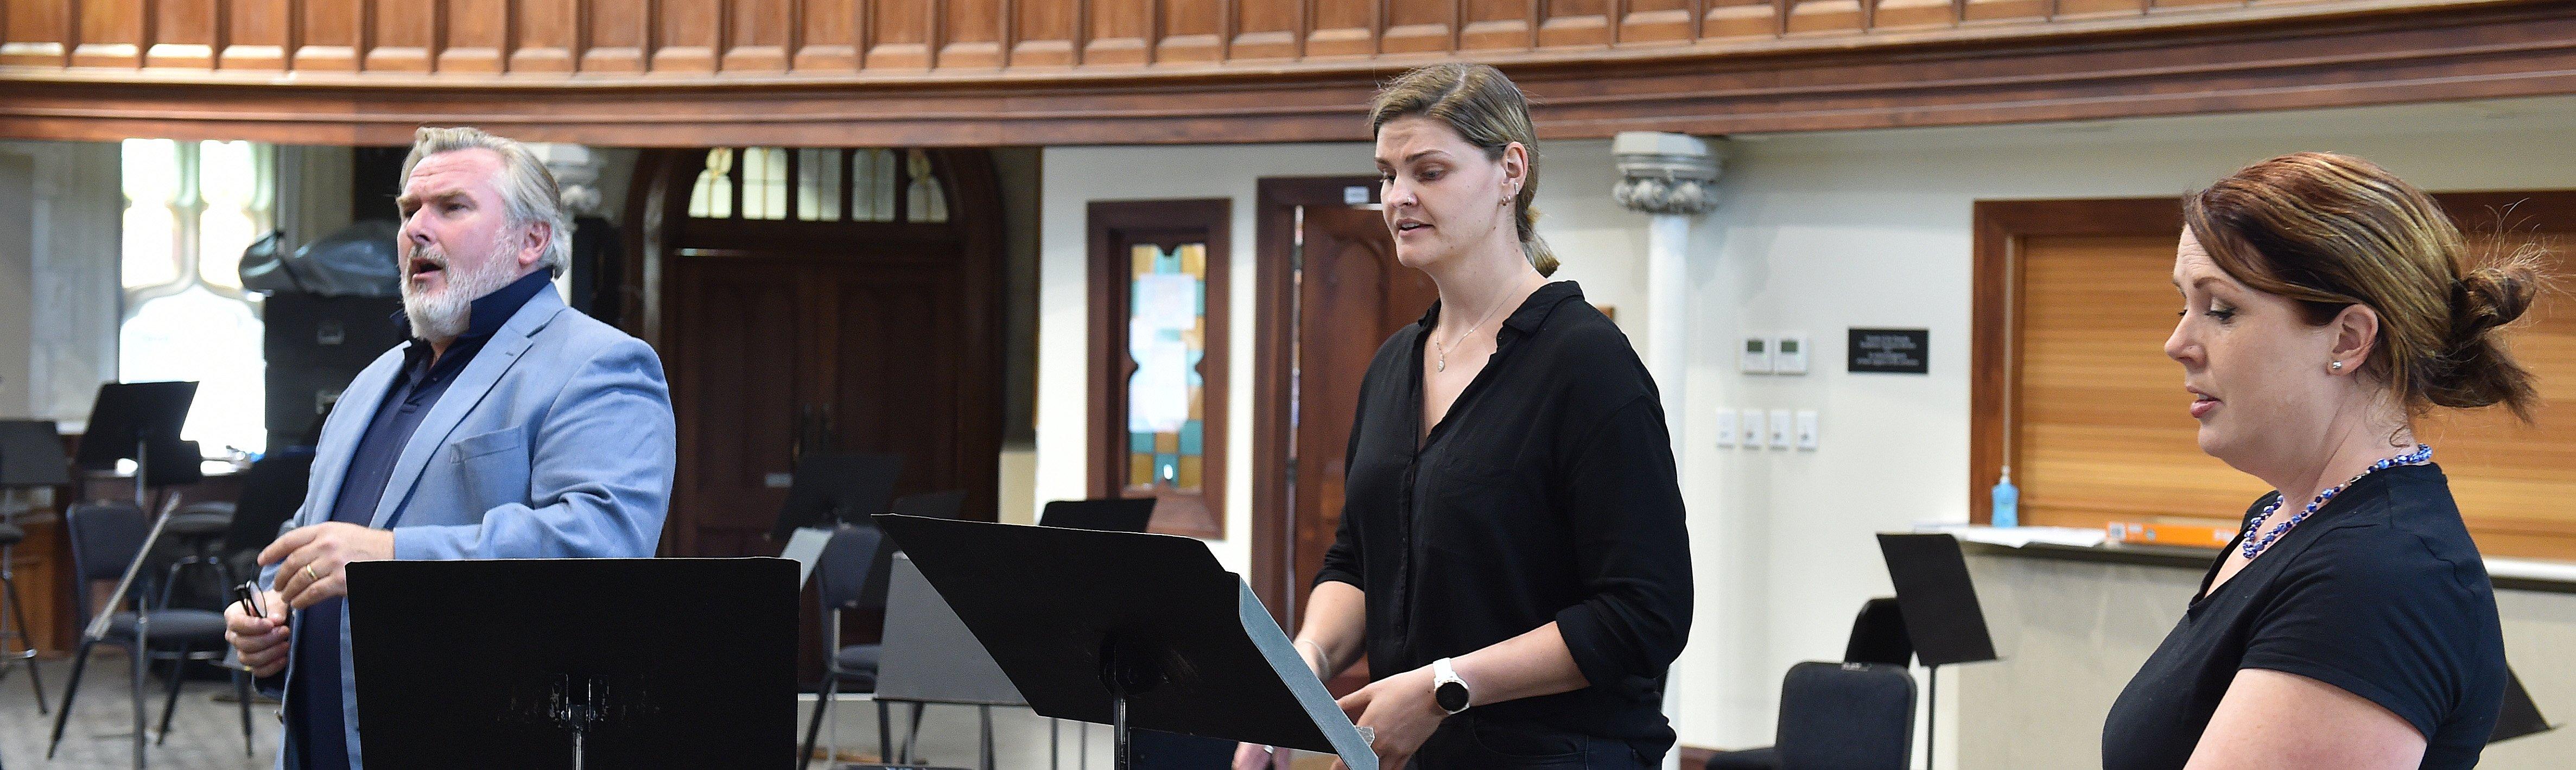 Simon O'Neill, Rhiannon Cooper and Anna Lease rehearse at Hanover Hall before Saturday night's '...